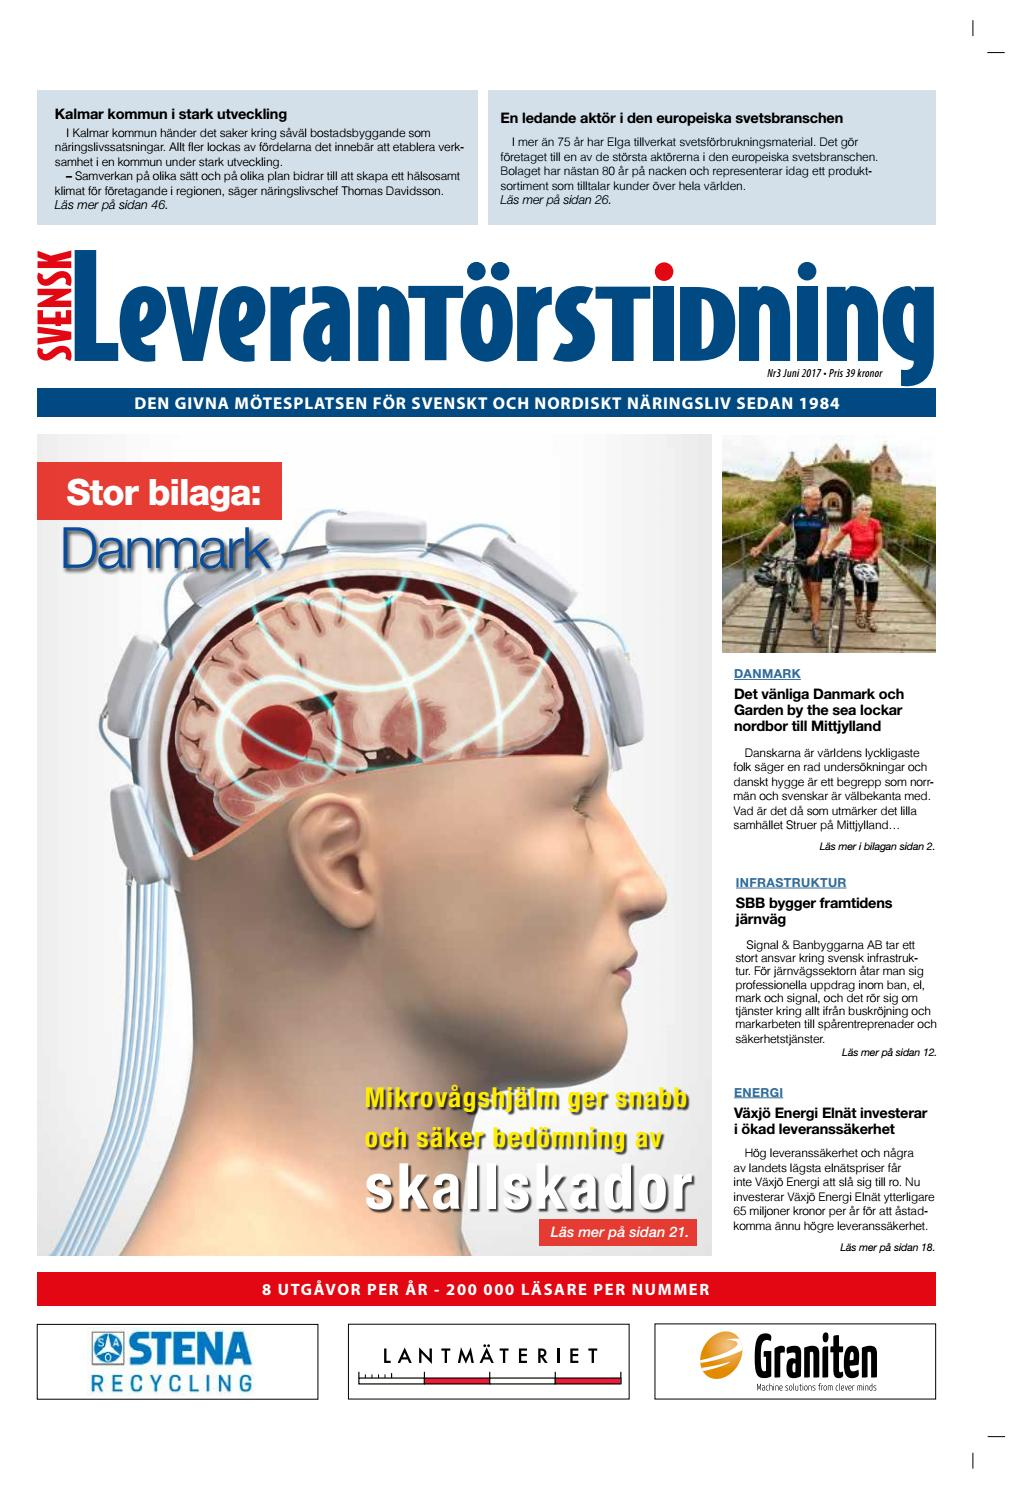 Svenska sagoambassadorer i dansk tjanst